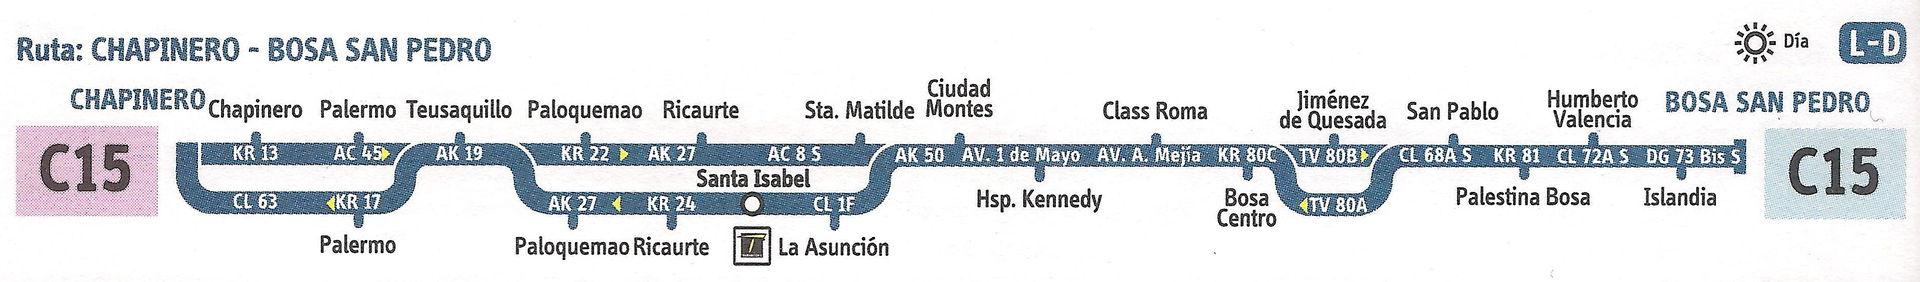 Ruta SITP: C15 Bosa, San Pedro ↔ Chapinero [Urbana] 2